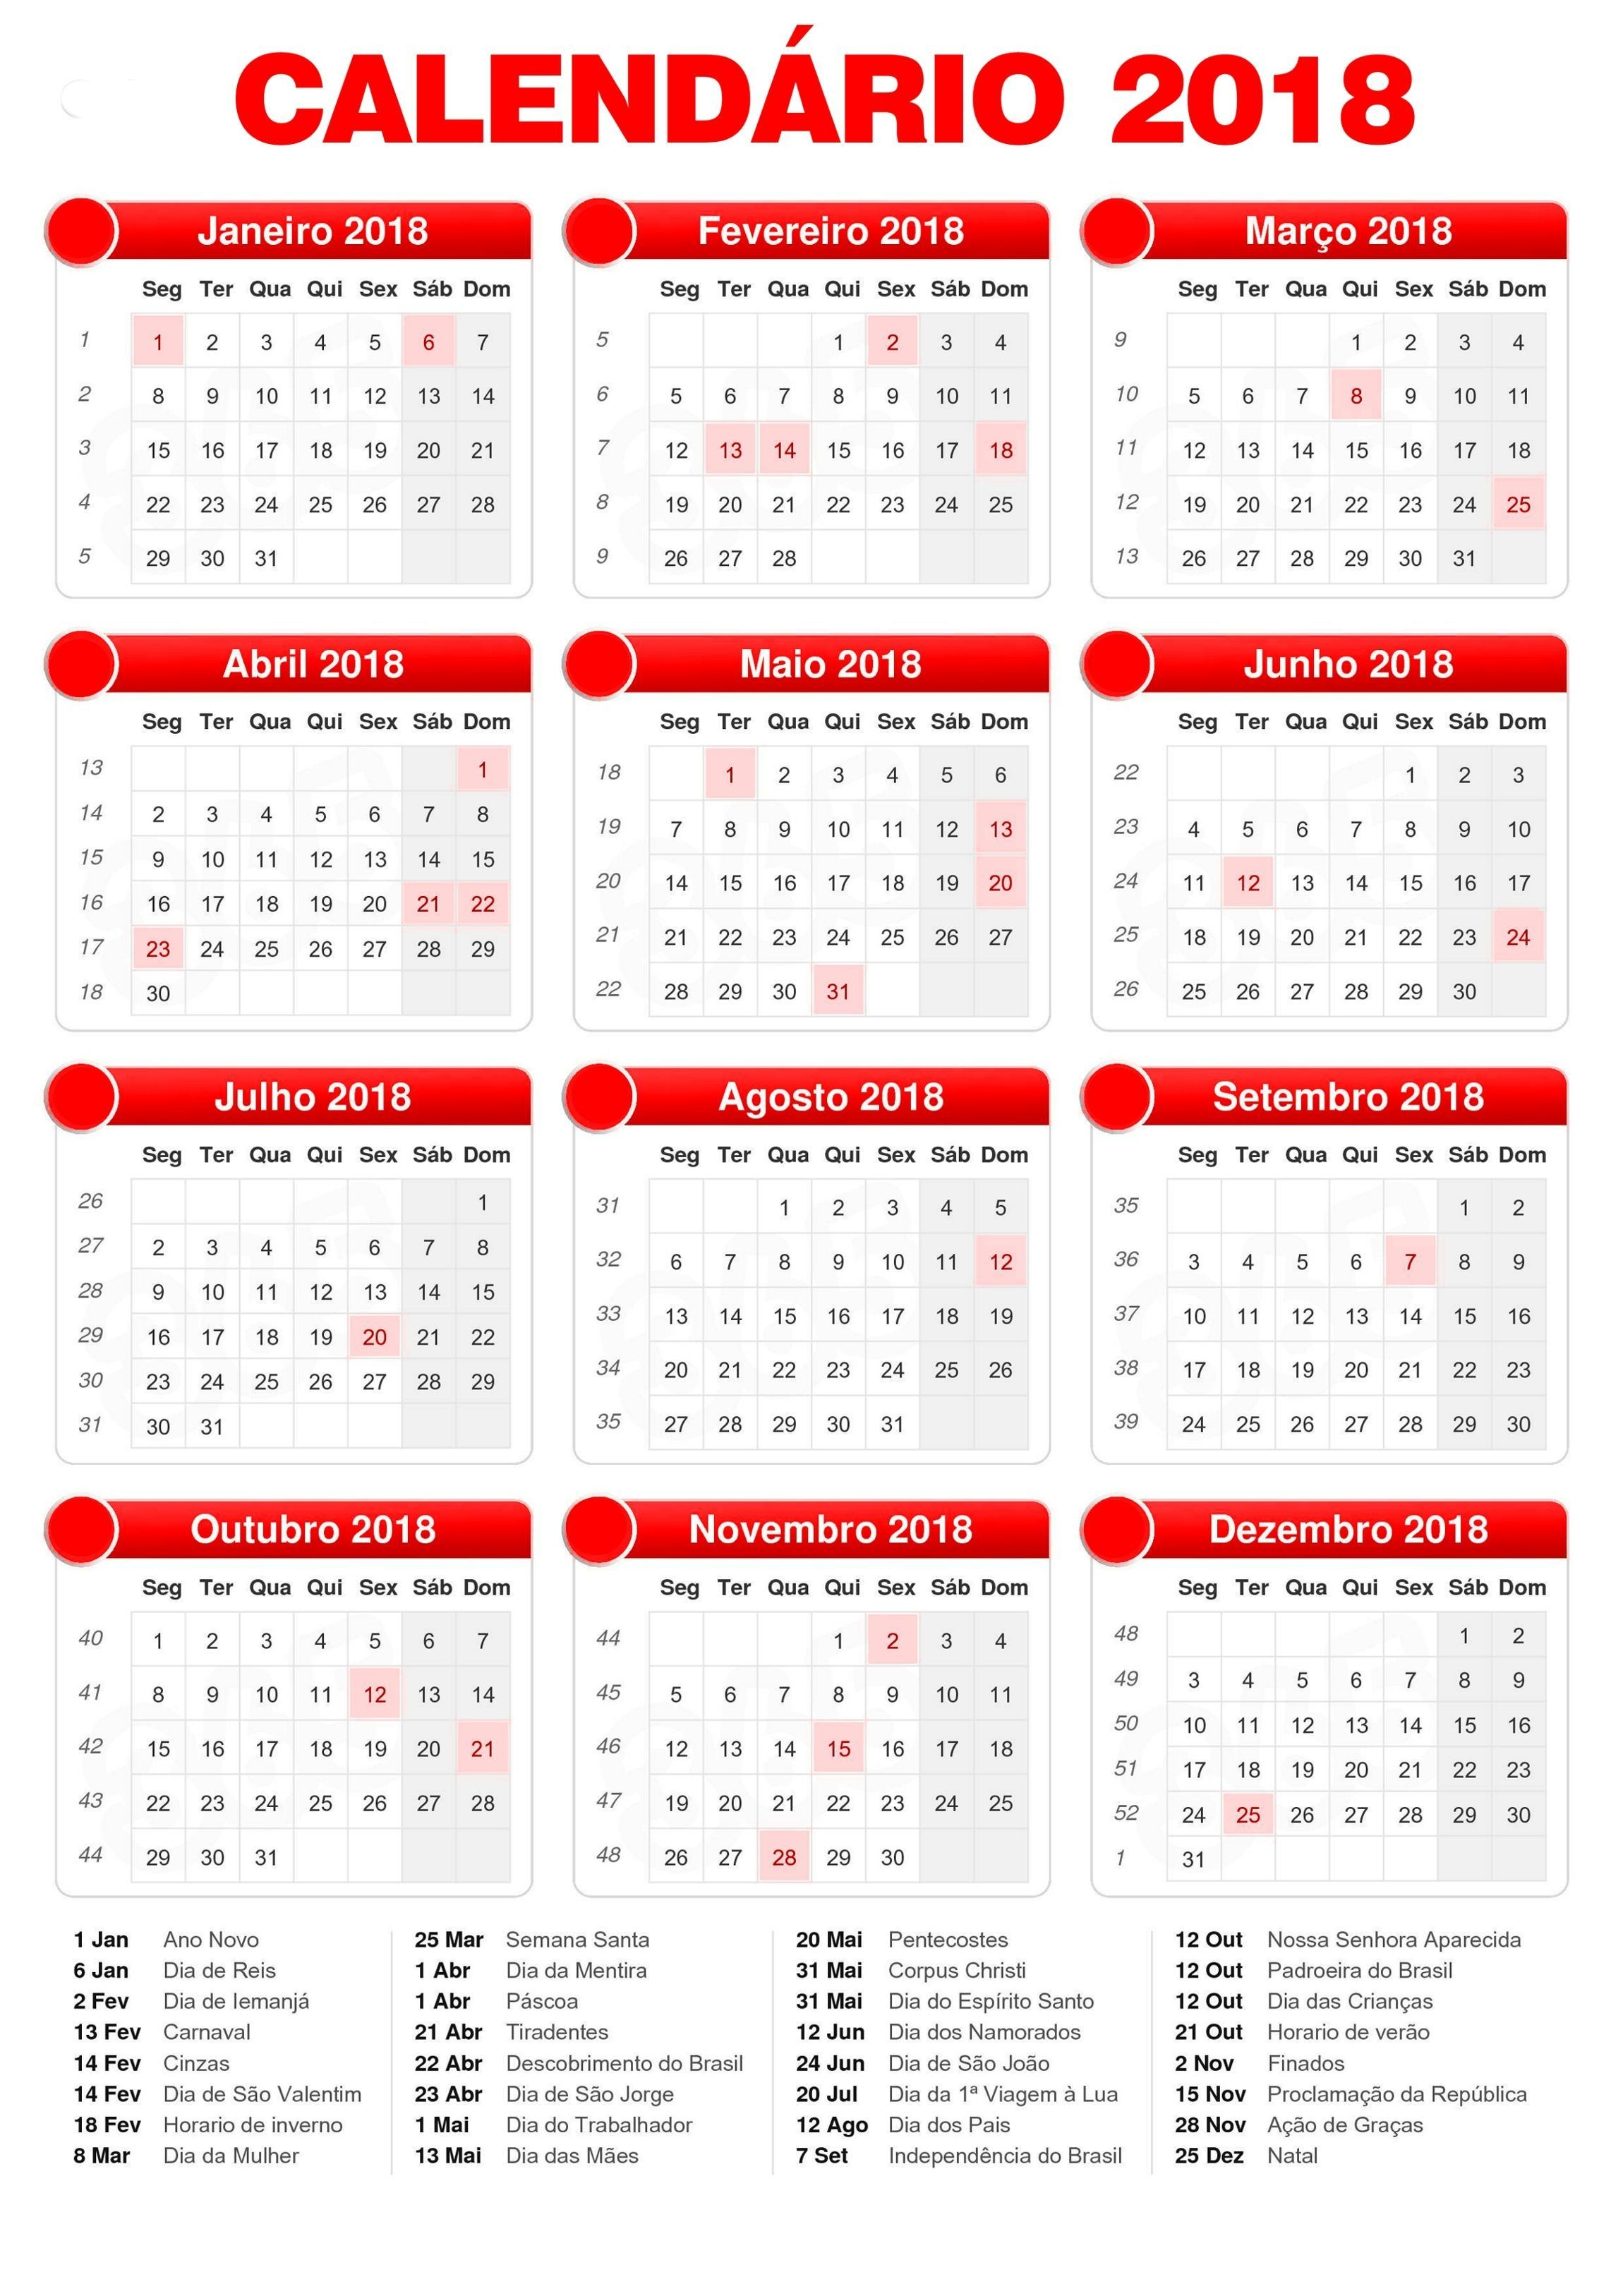 Imprimir Calendario De Rusia 2019 Más Actual Calendario 2018 Feriados 2018 2018 2019 Calendário 2018 Of Imprimir Calendario De Rusia 2019 Más Actual Eur Lex R3821 En Eur Lex